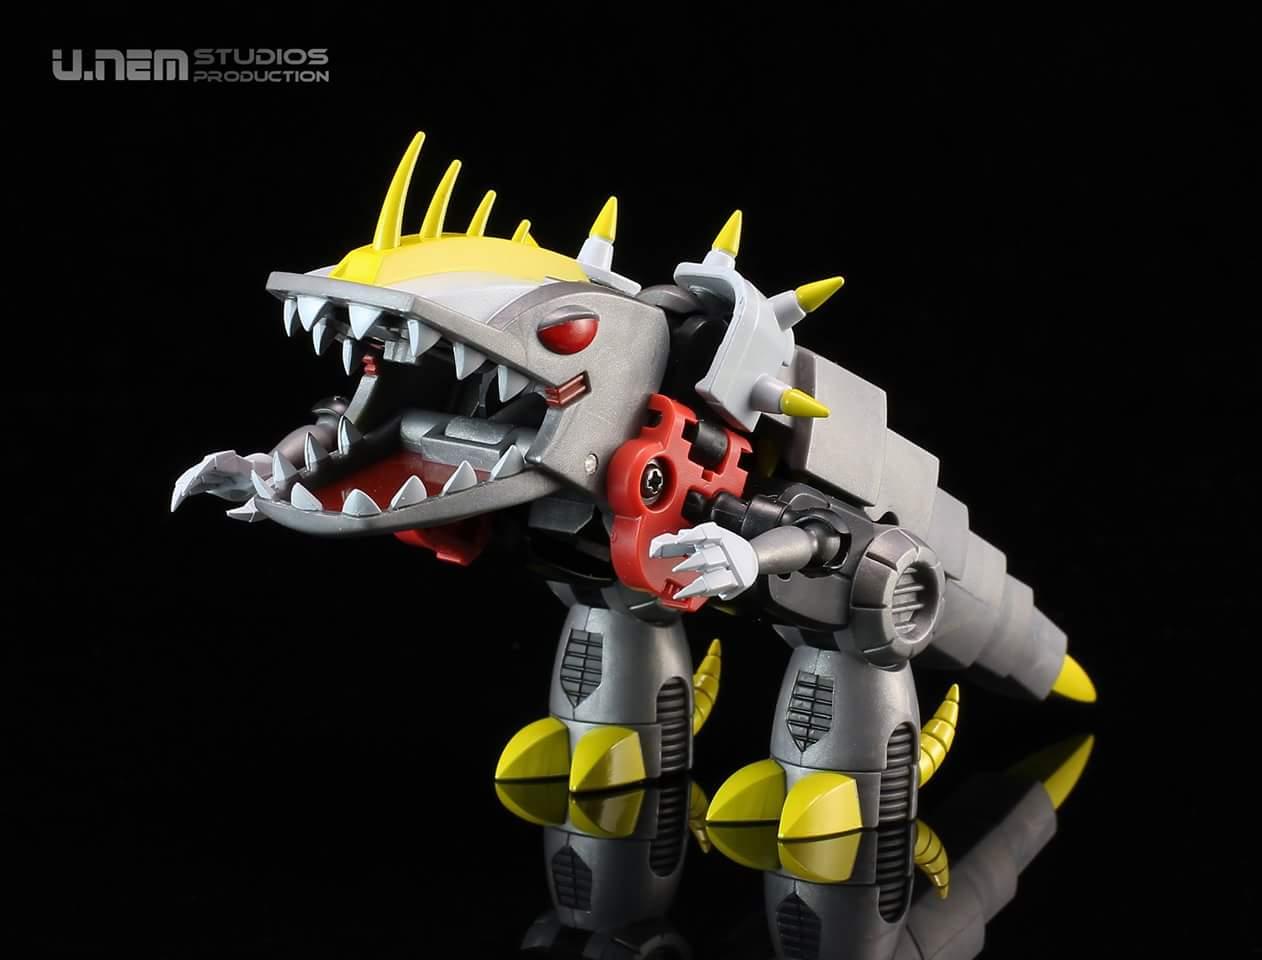 Produit Tiers: [Corbot V] CV-002 Mugger - aka Allicon   [Unique Toys] G-02 Sharky - aka Sharkticon/Requanicon W8YMb0pM